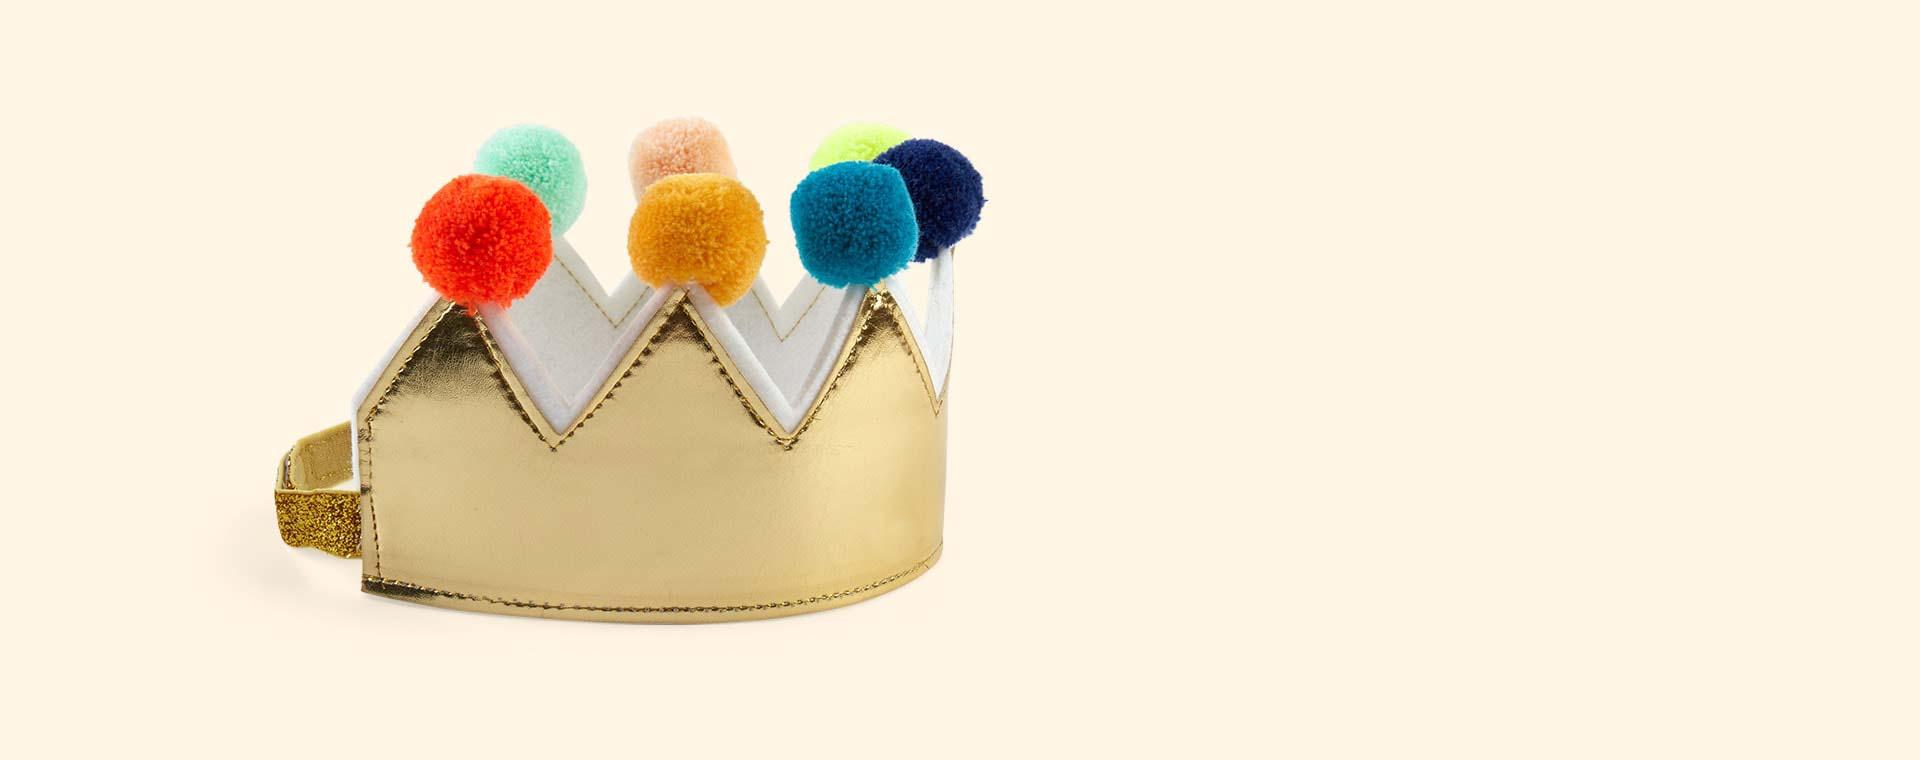 Gold Meri Meri Dress Up Crown